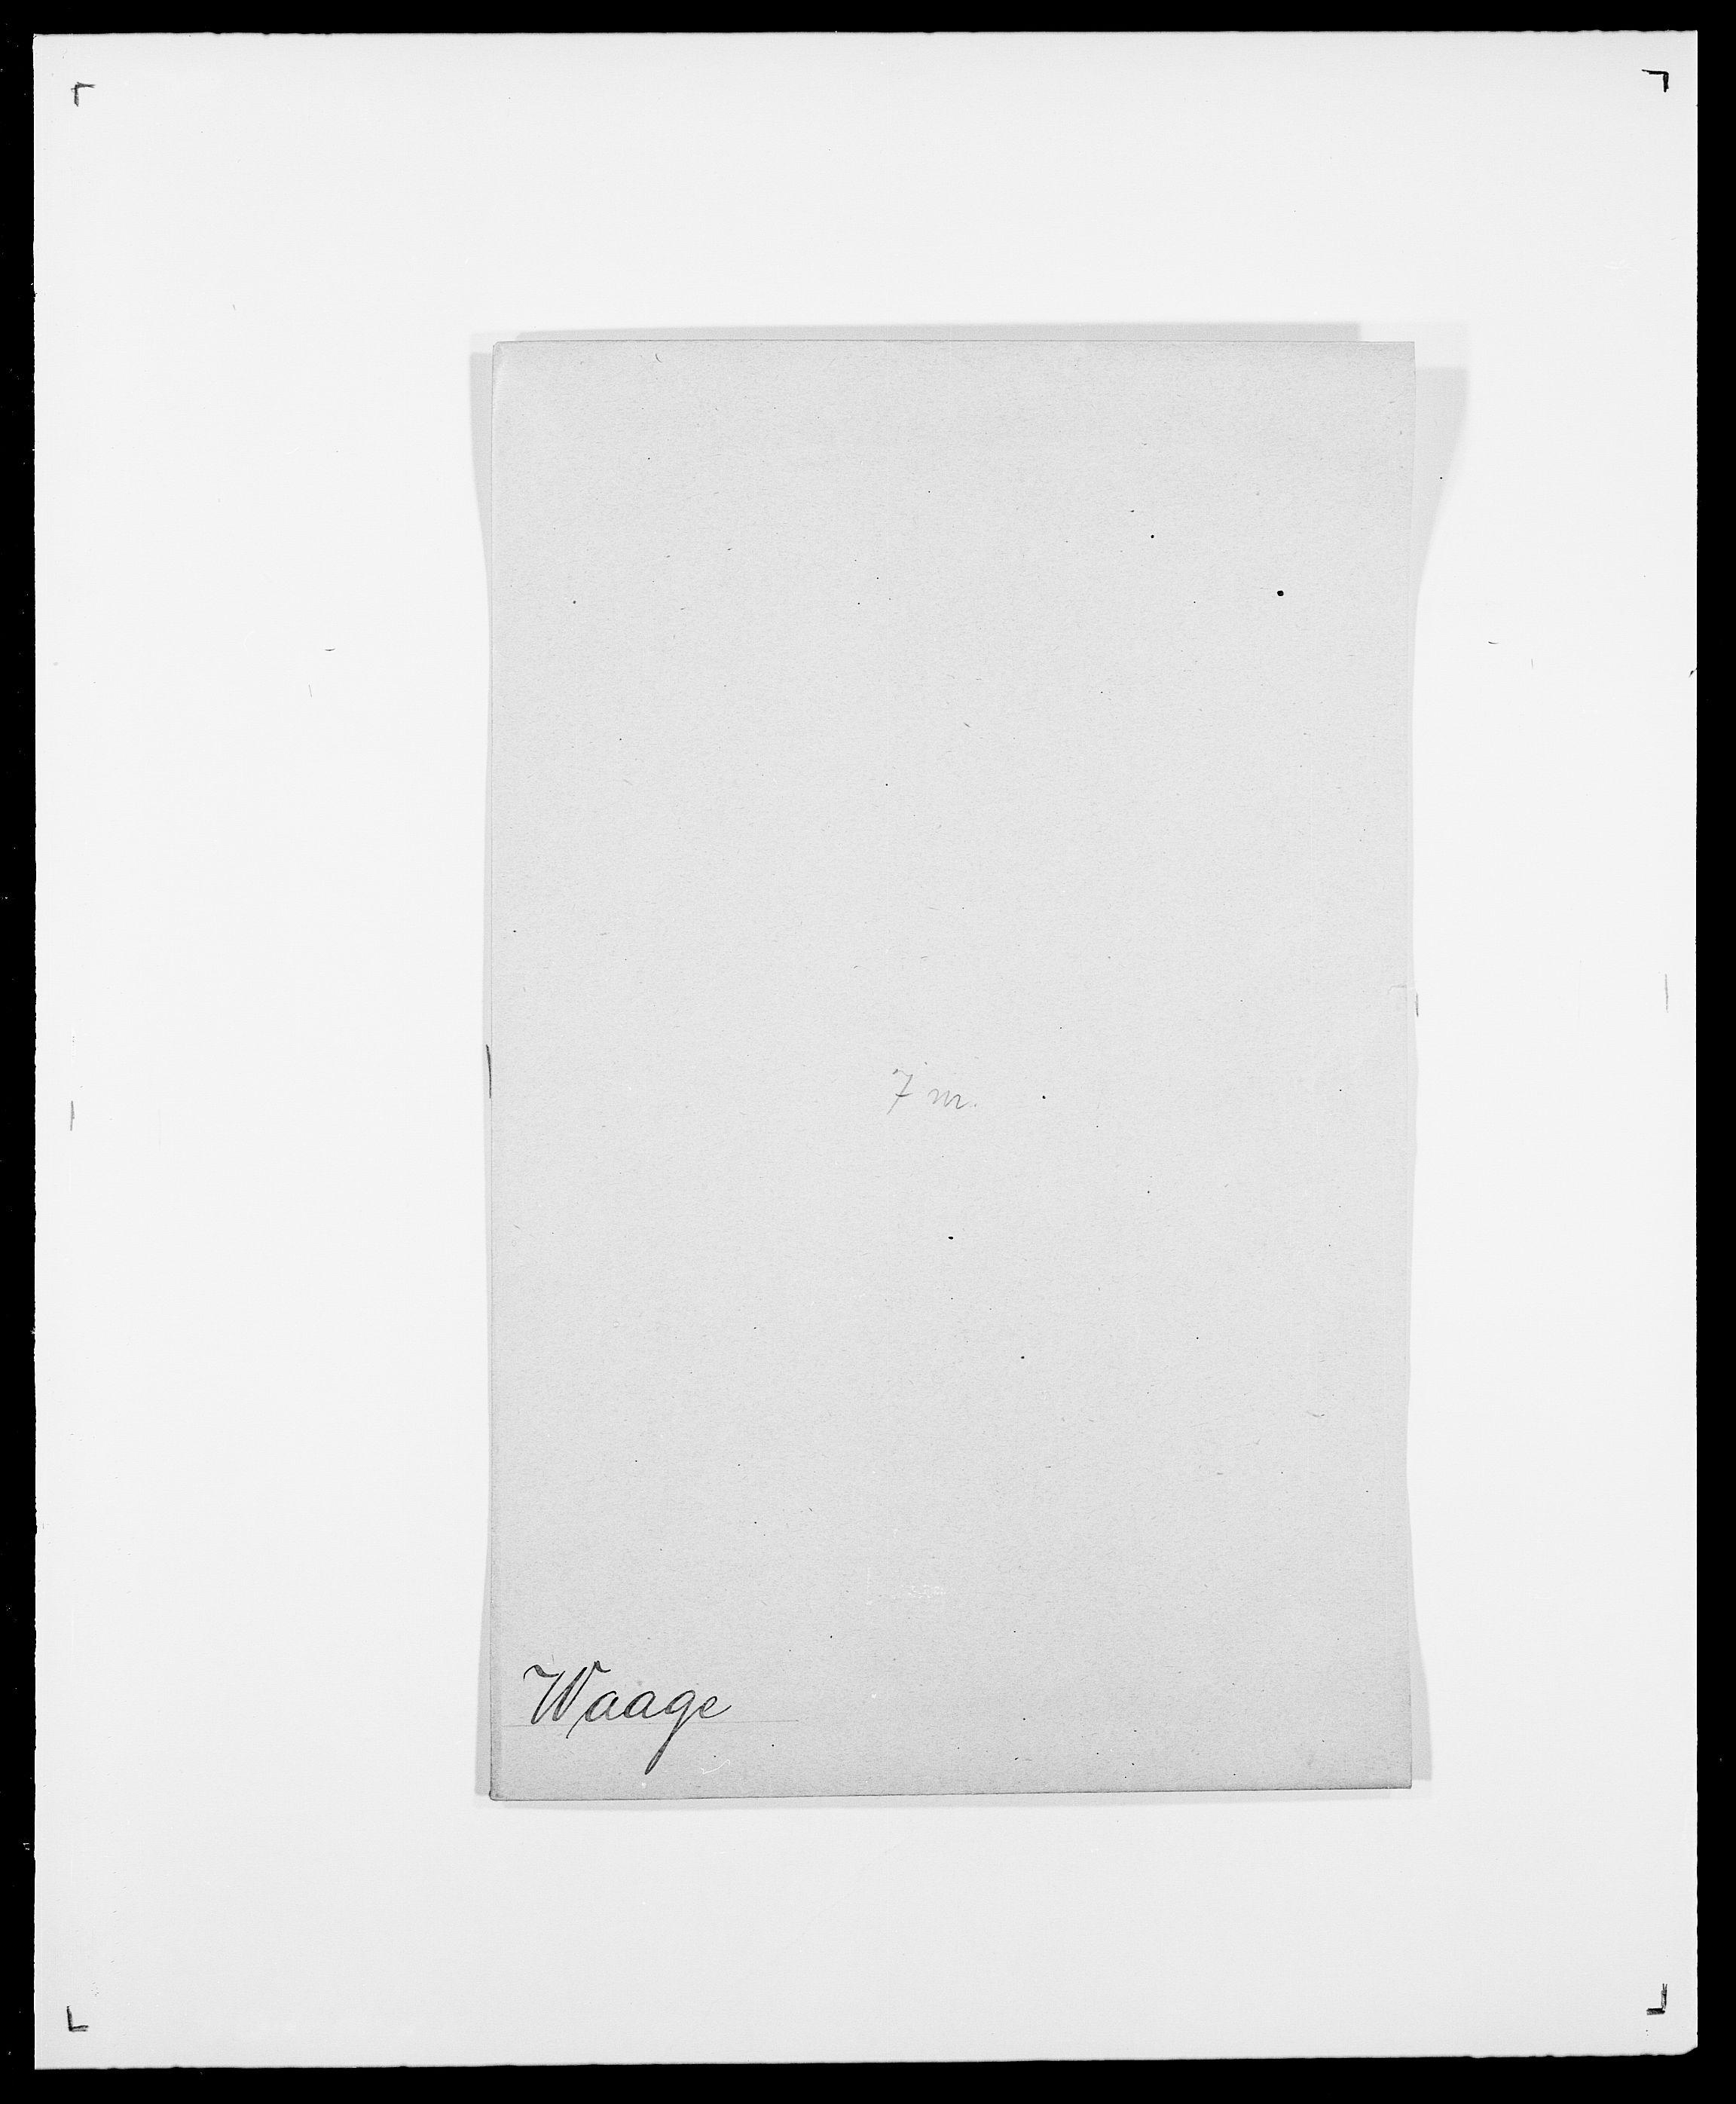 SAO, Delgobe, Charles Antoine - samling, D/Da/L0040: Usgaard - Velund, s. 46